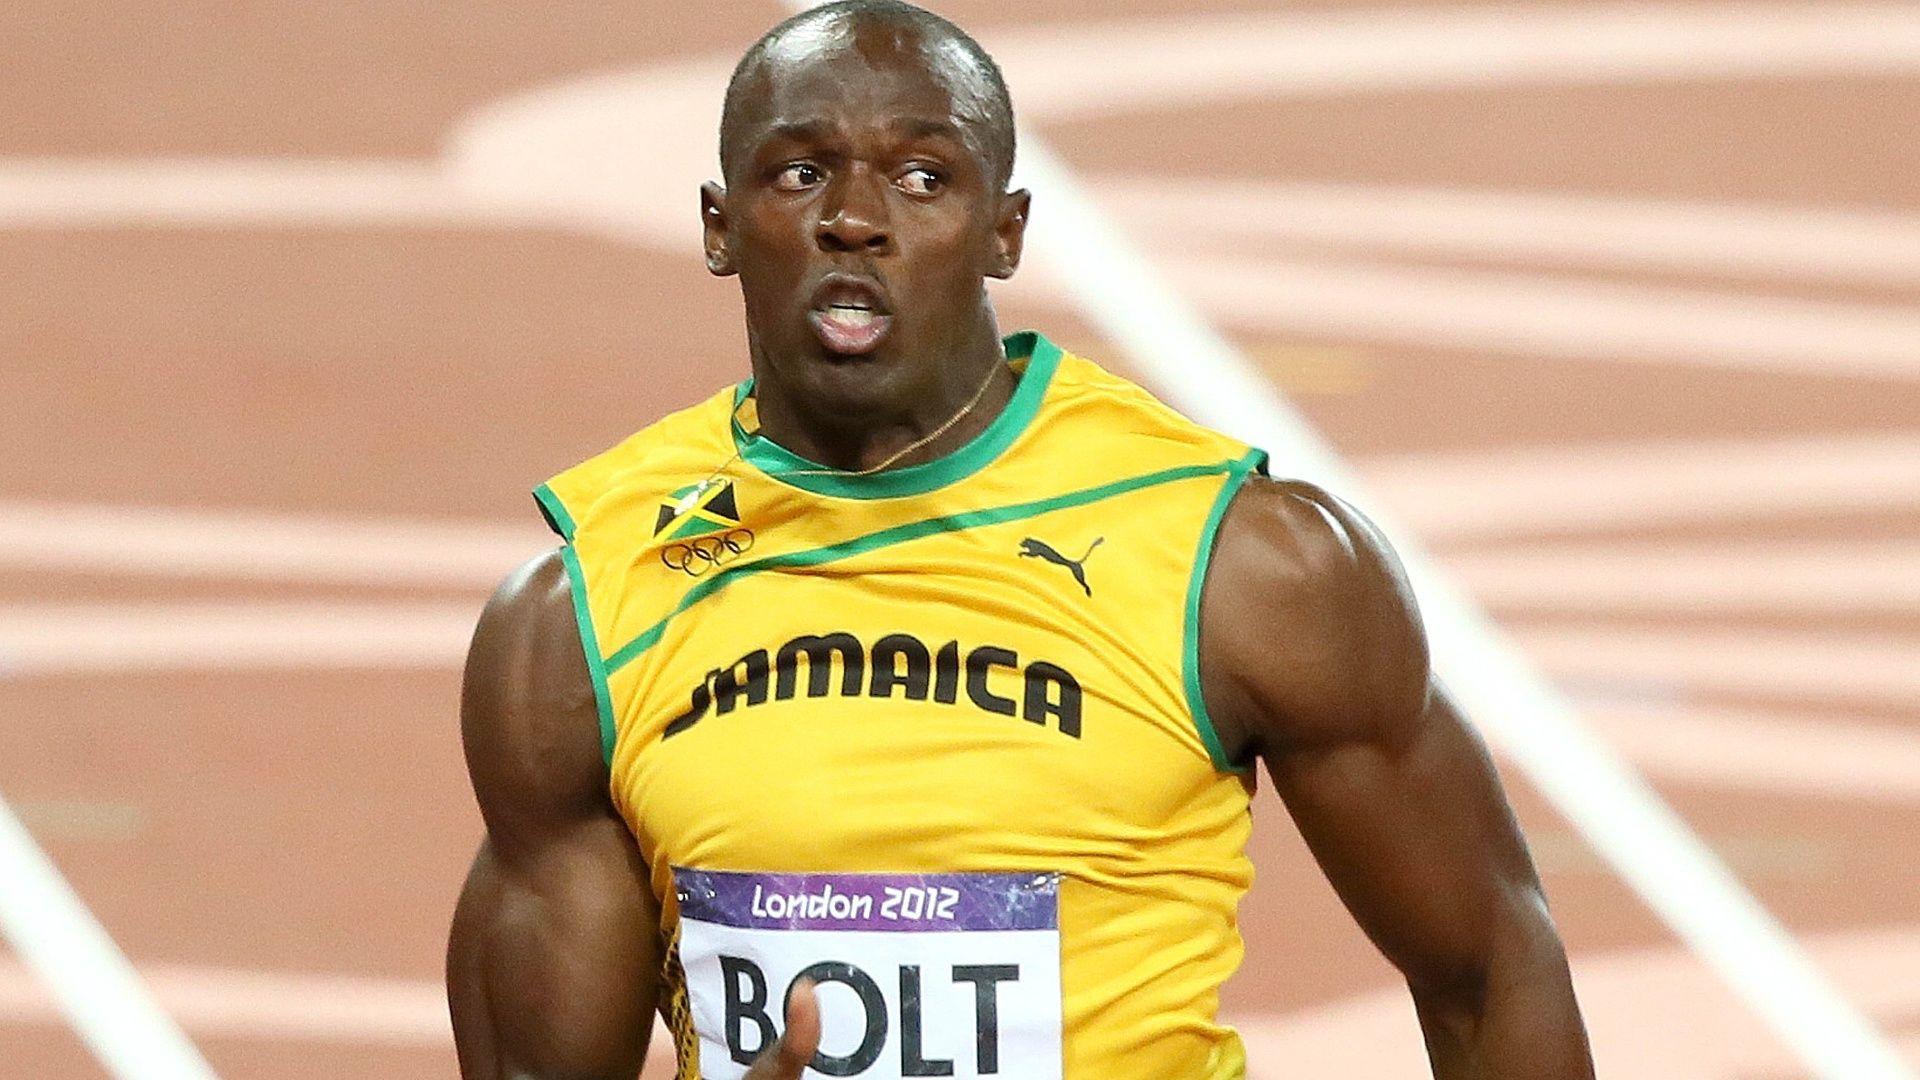 Usain Bolt Background